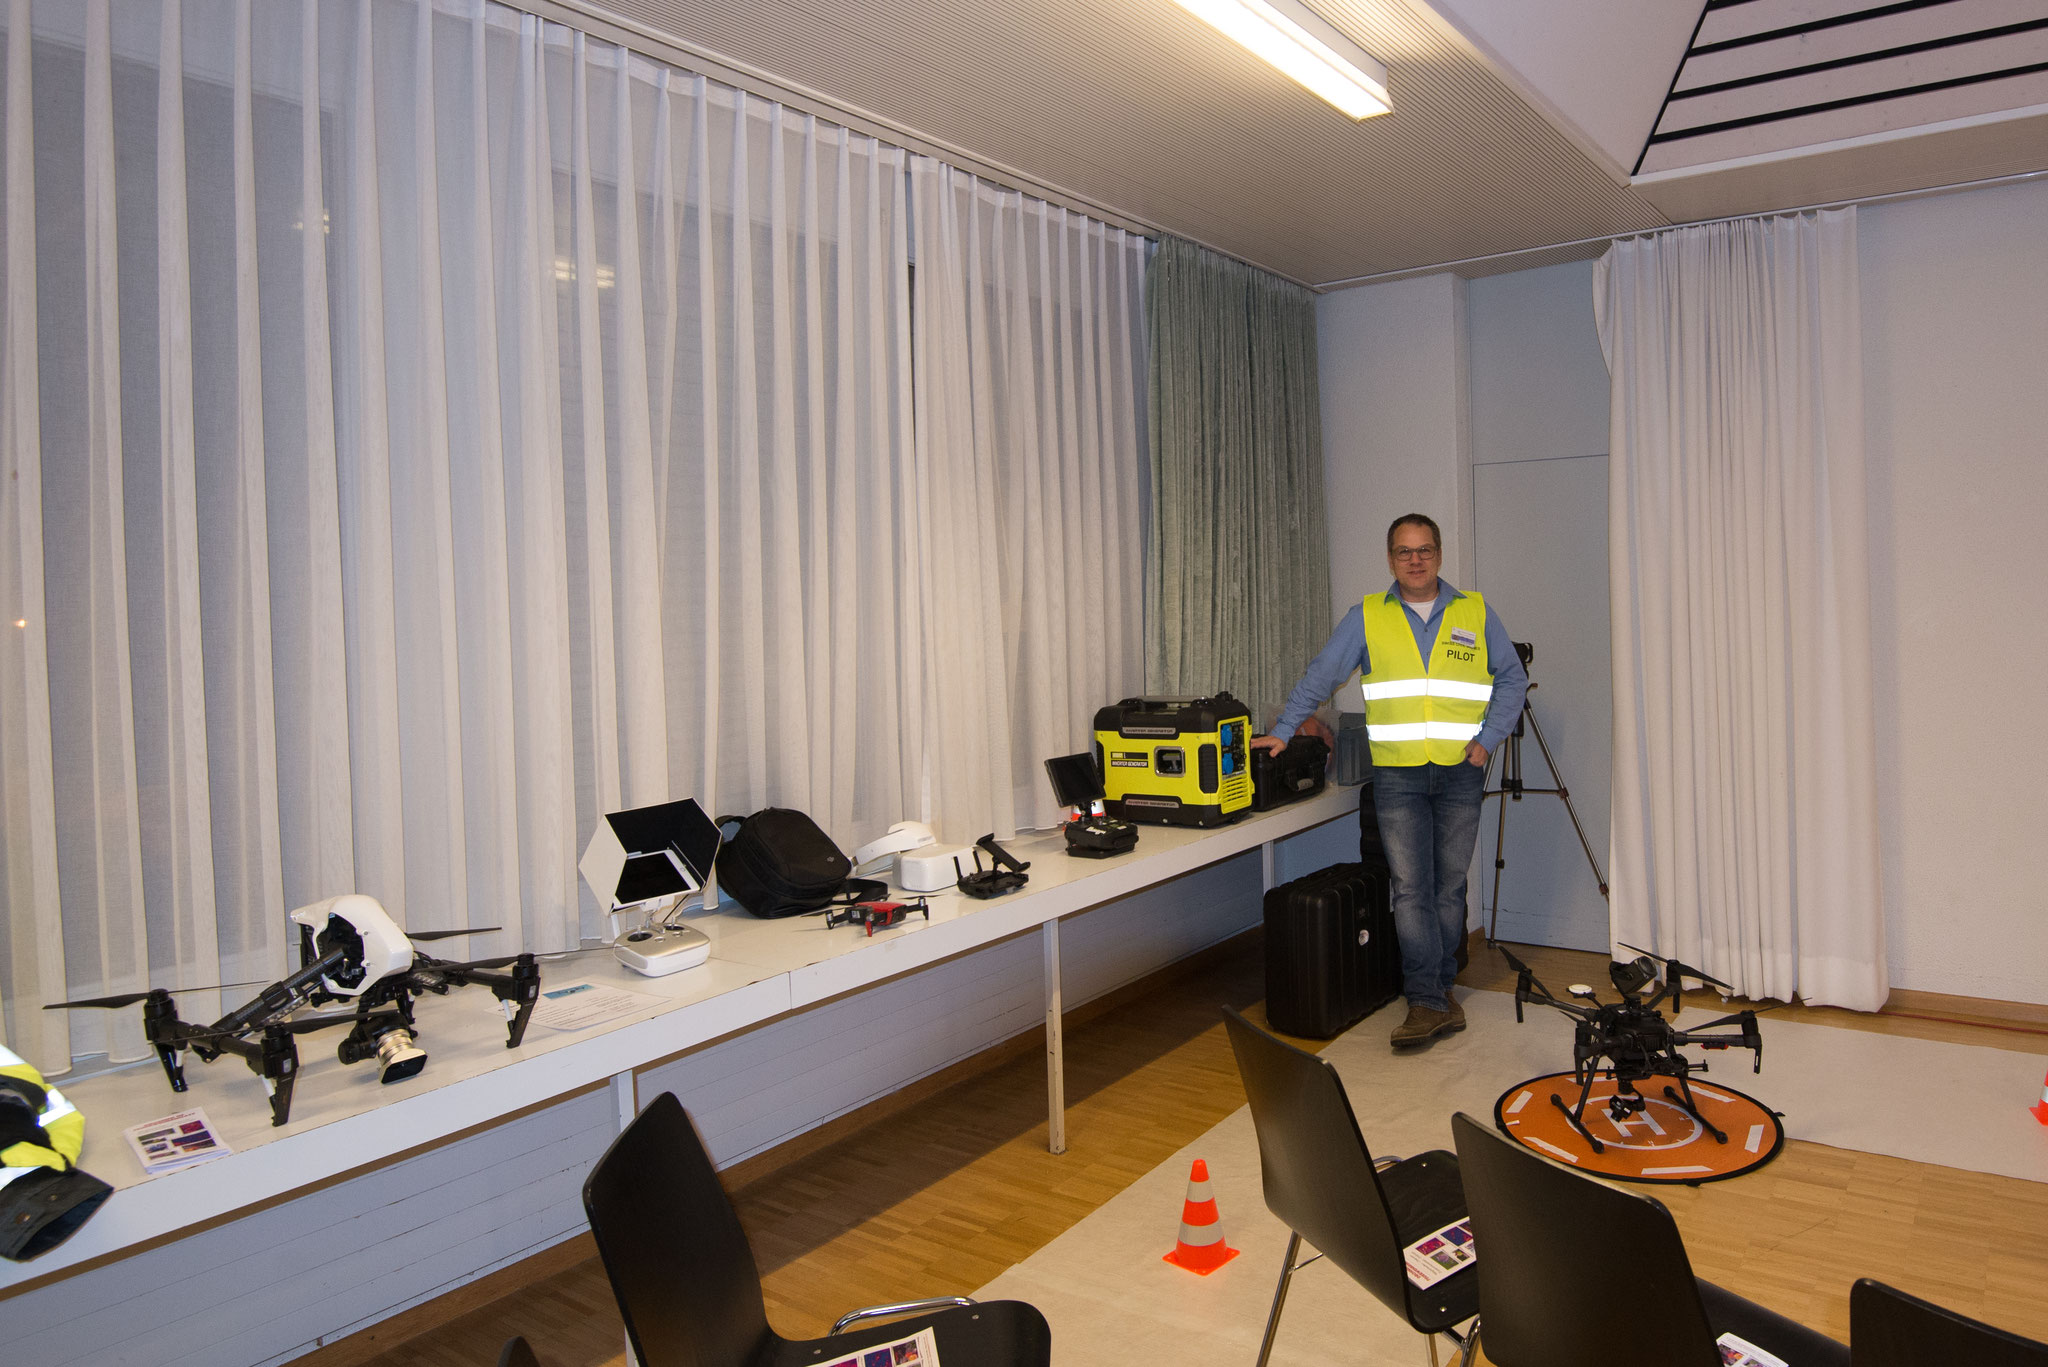 Christian Feldmann mit seinem Equipment